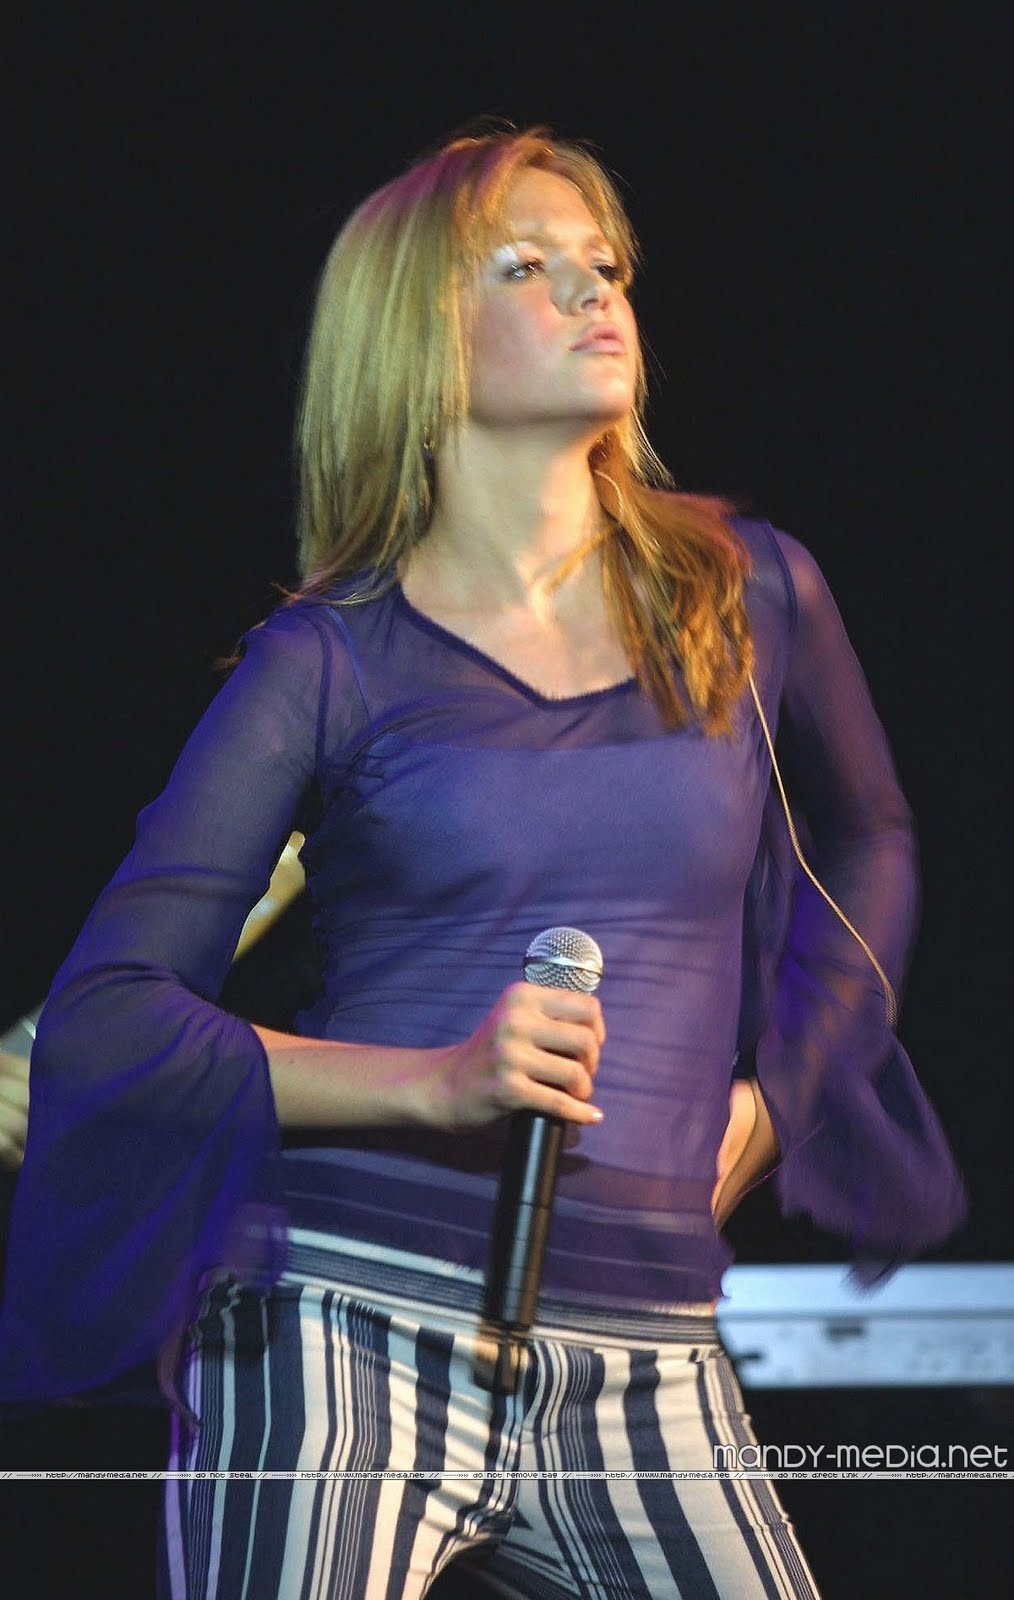 Jessica ashley miss june 2014 - 3 3